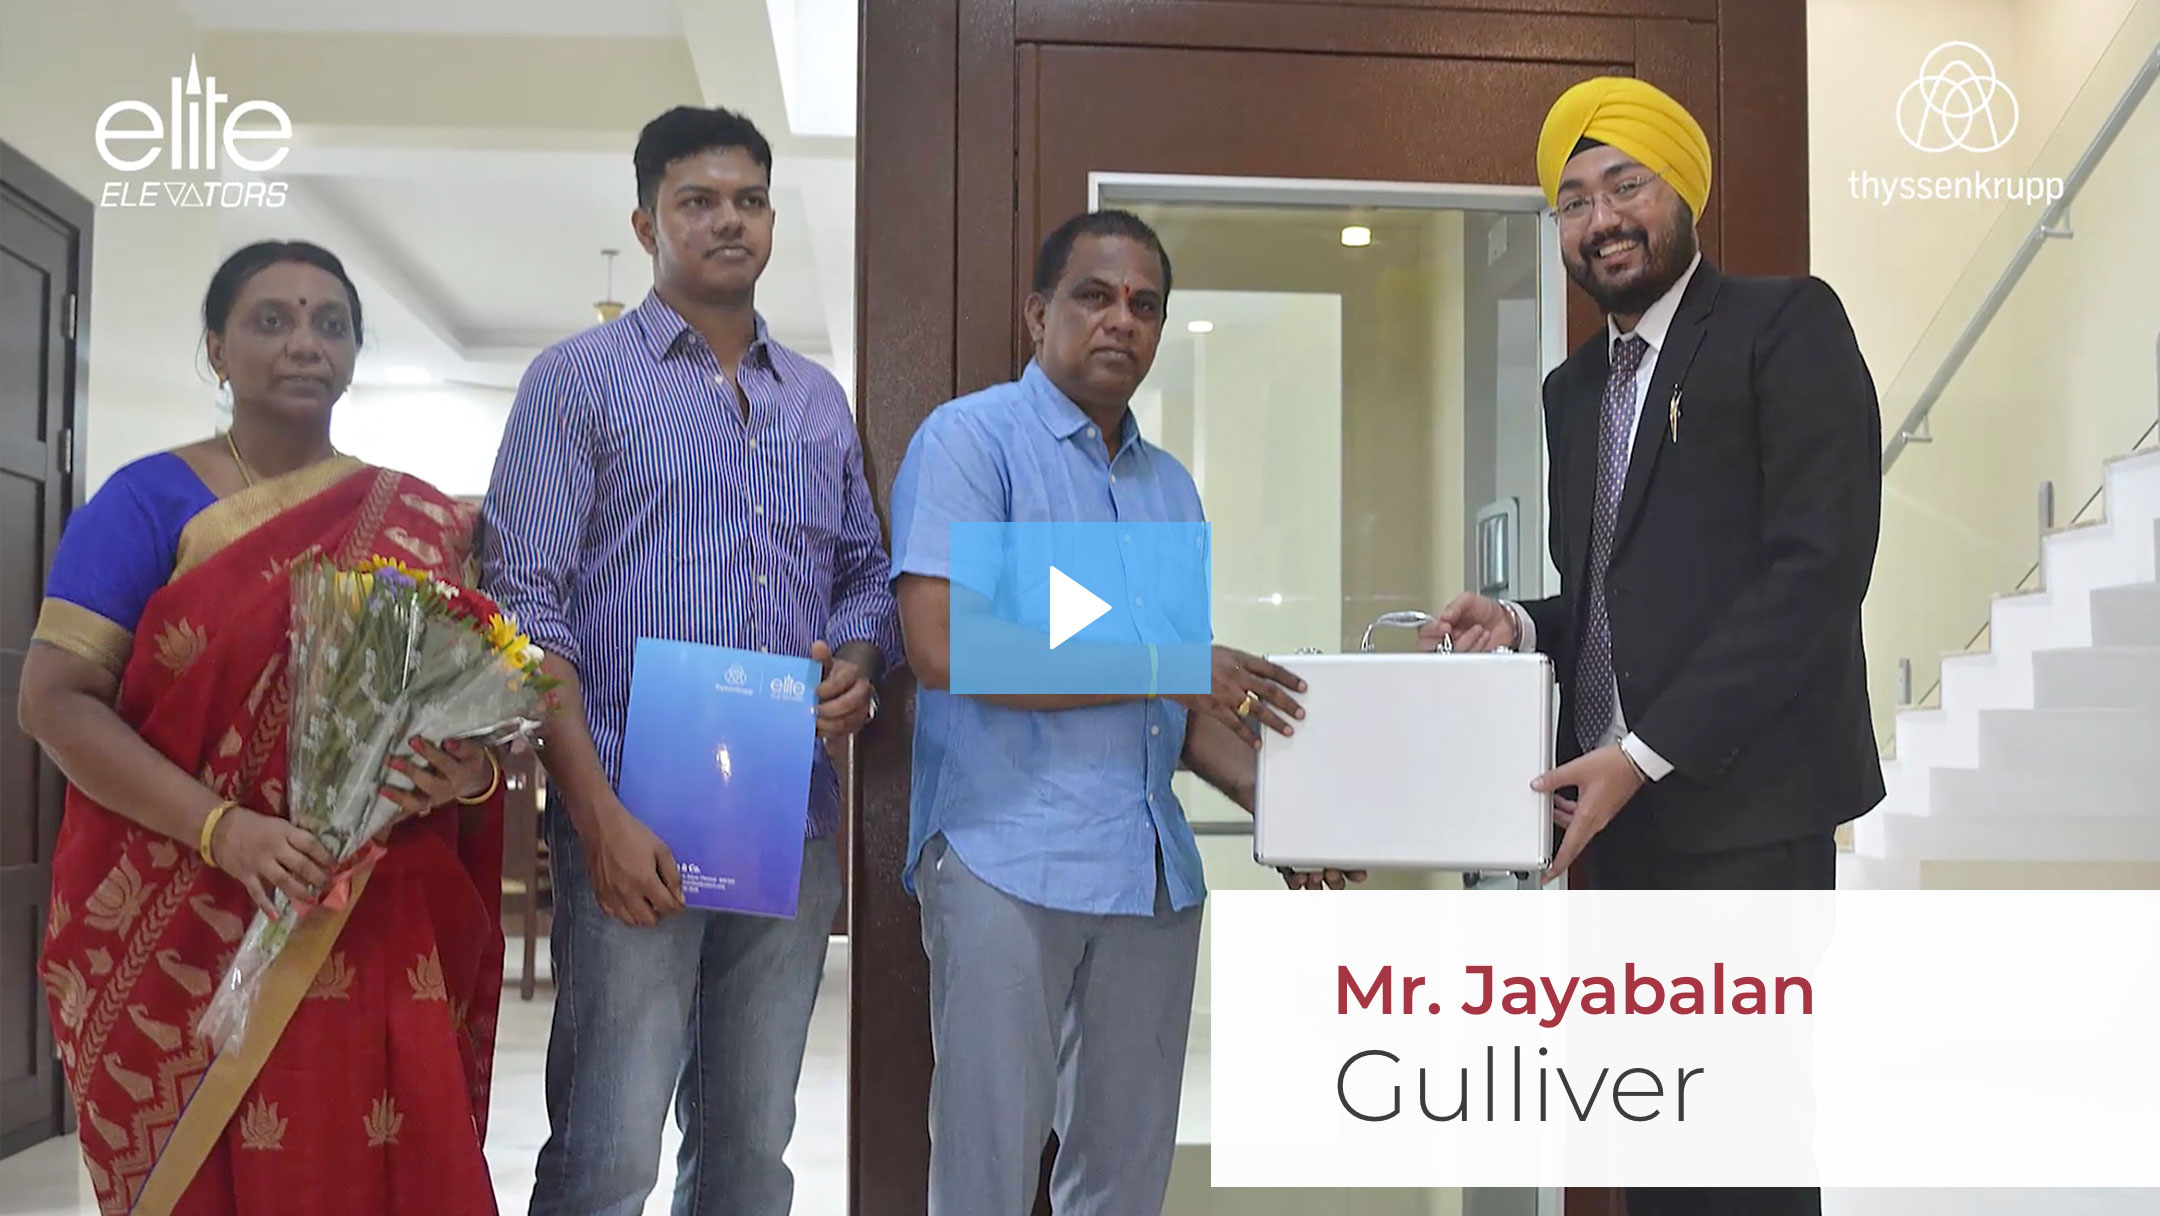 Mr. Jayabalan Testimonials